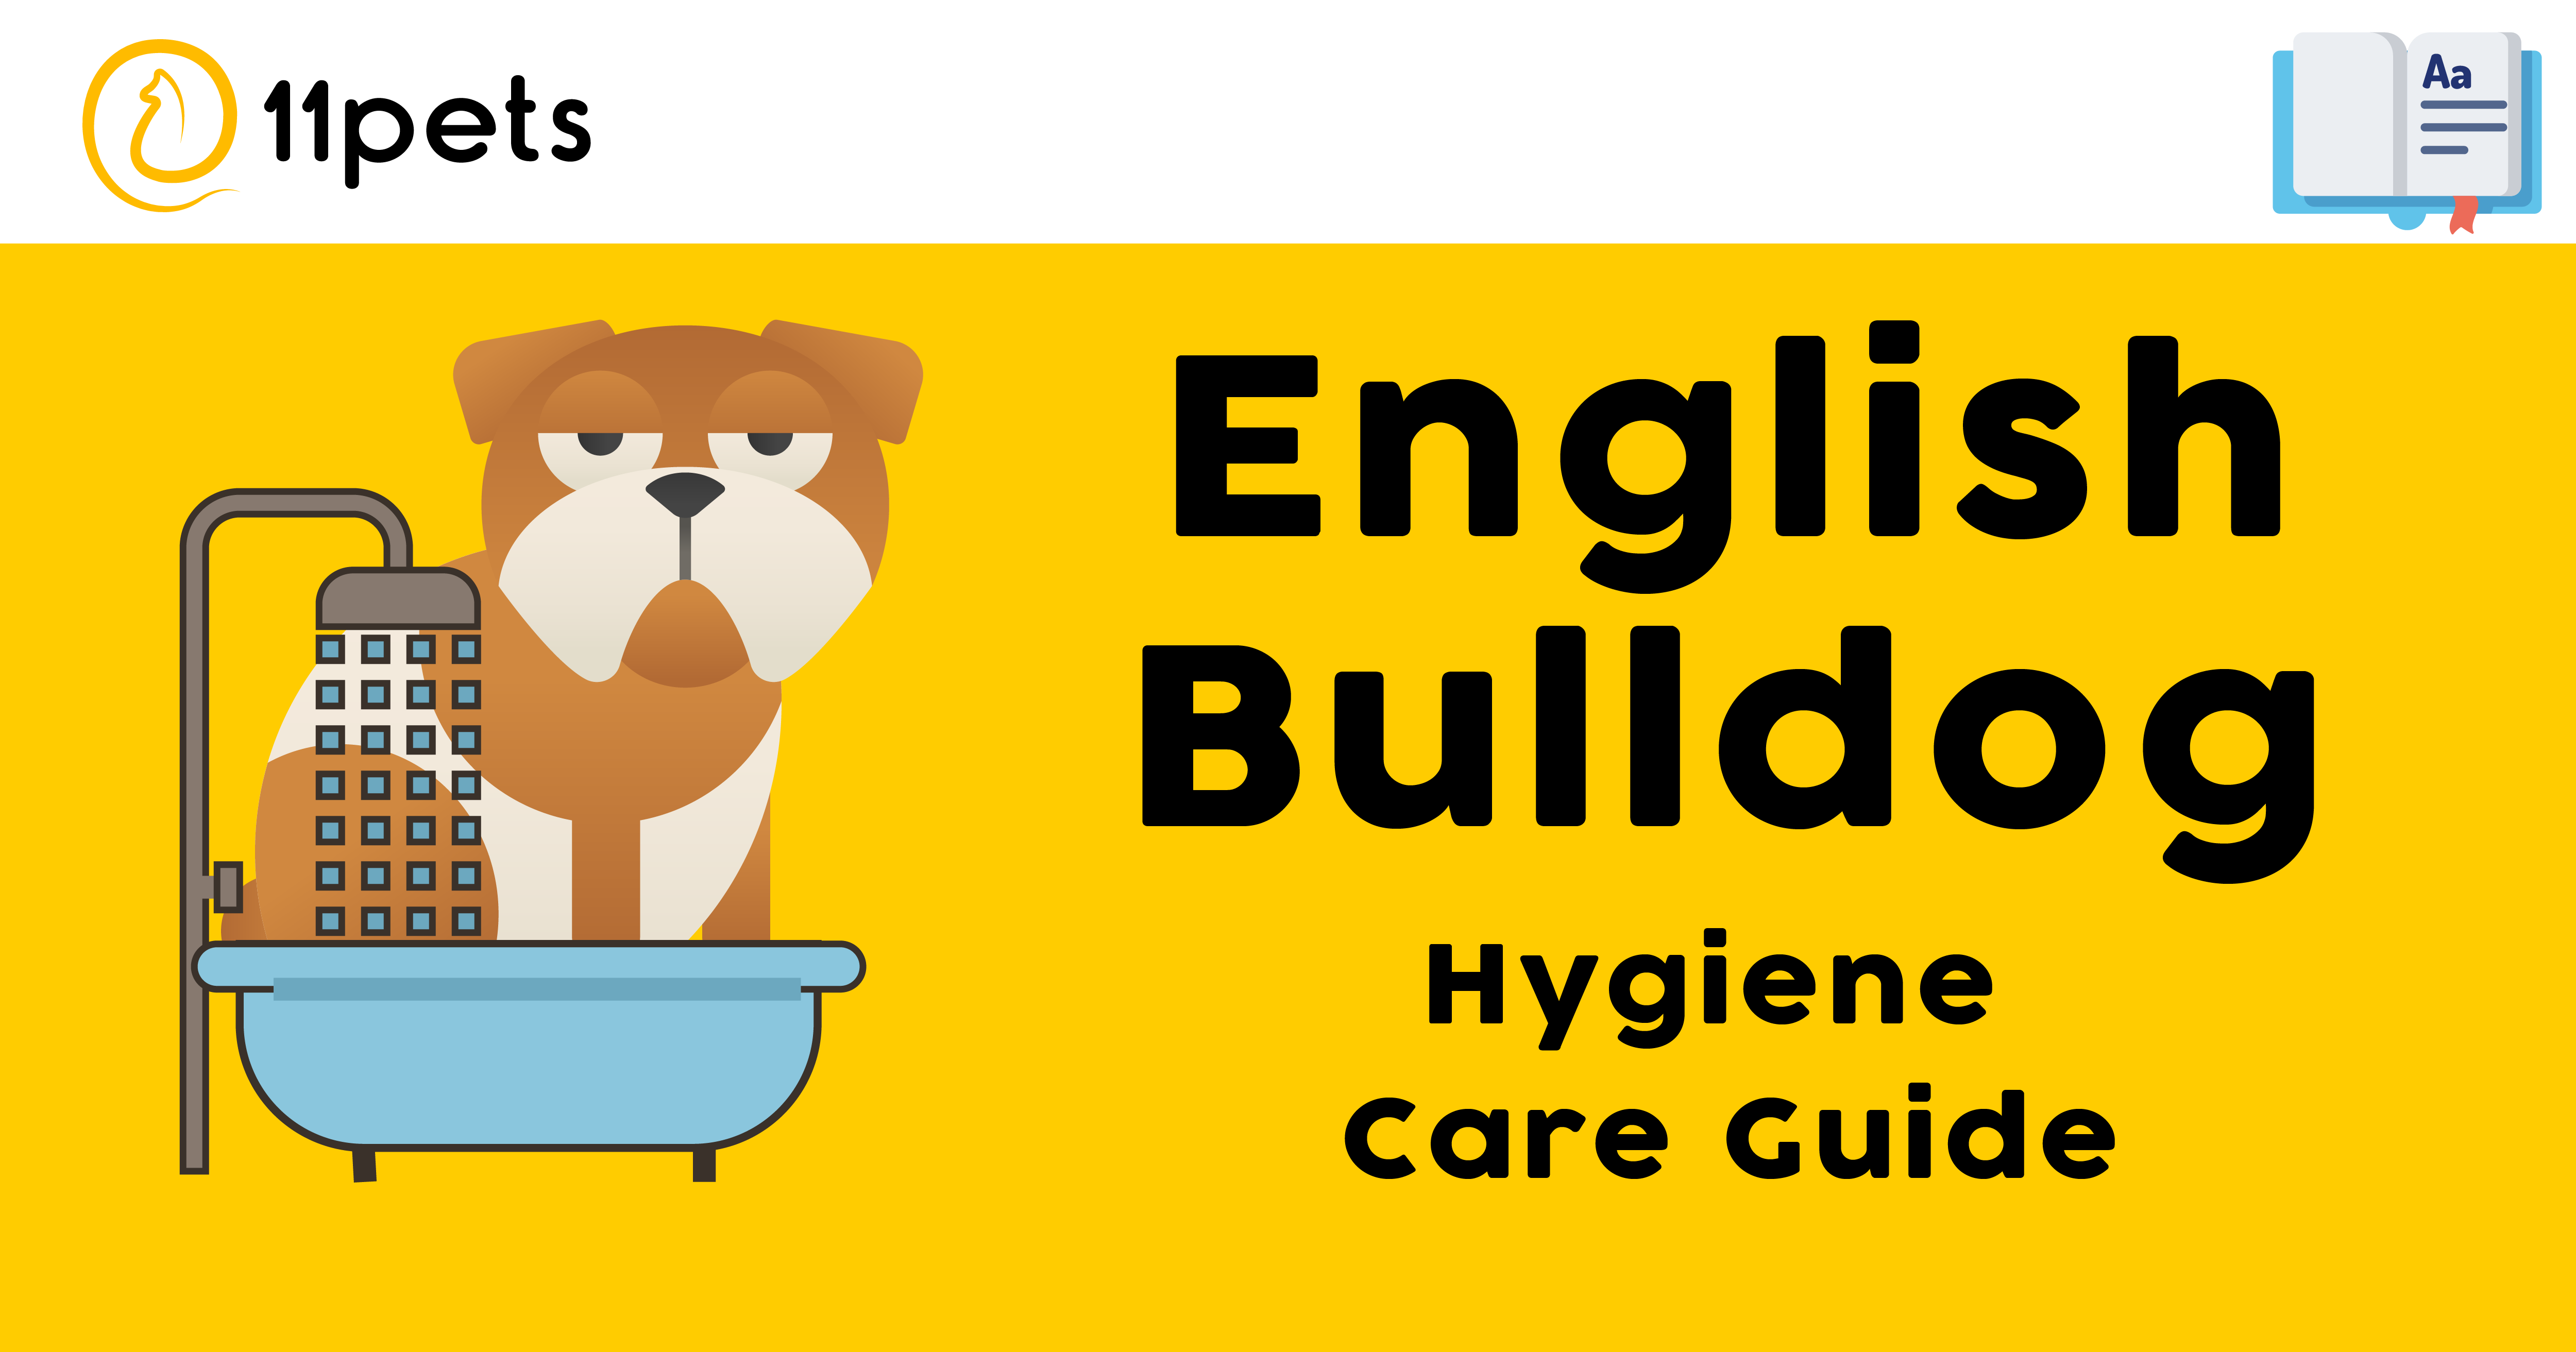 Hygiene Care Guide for English Bulldog